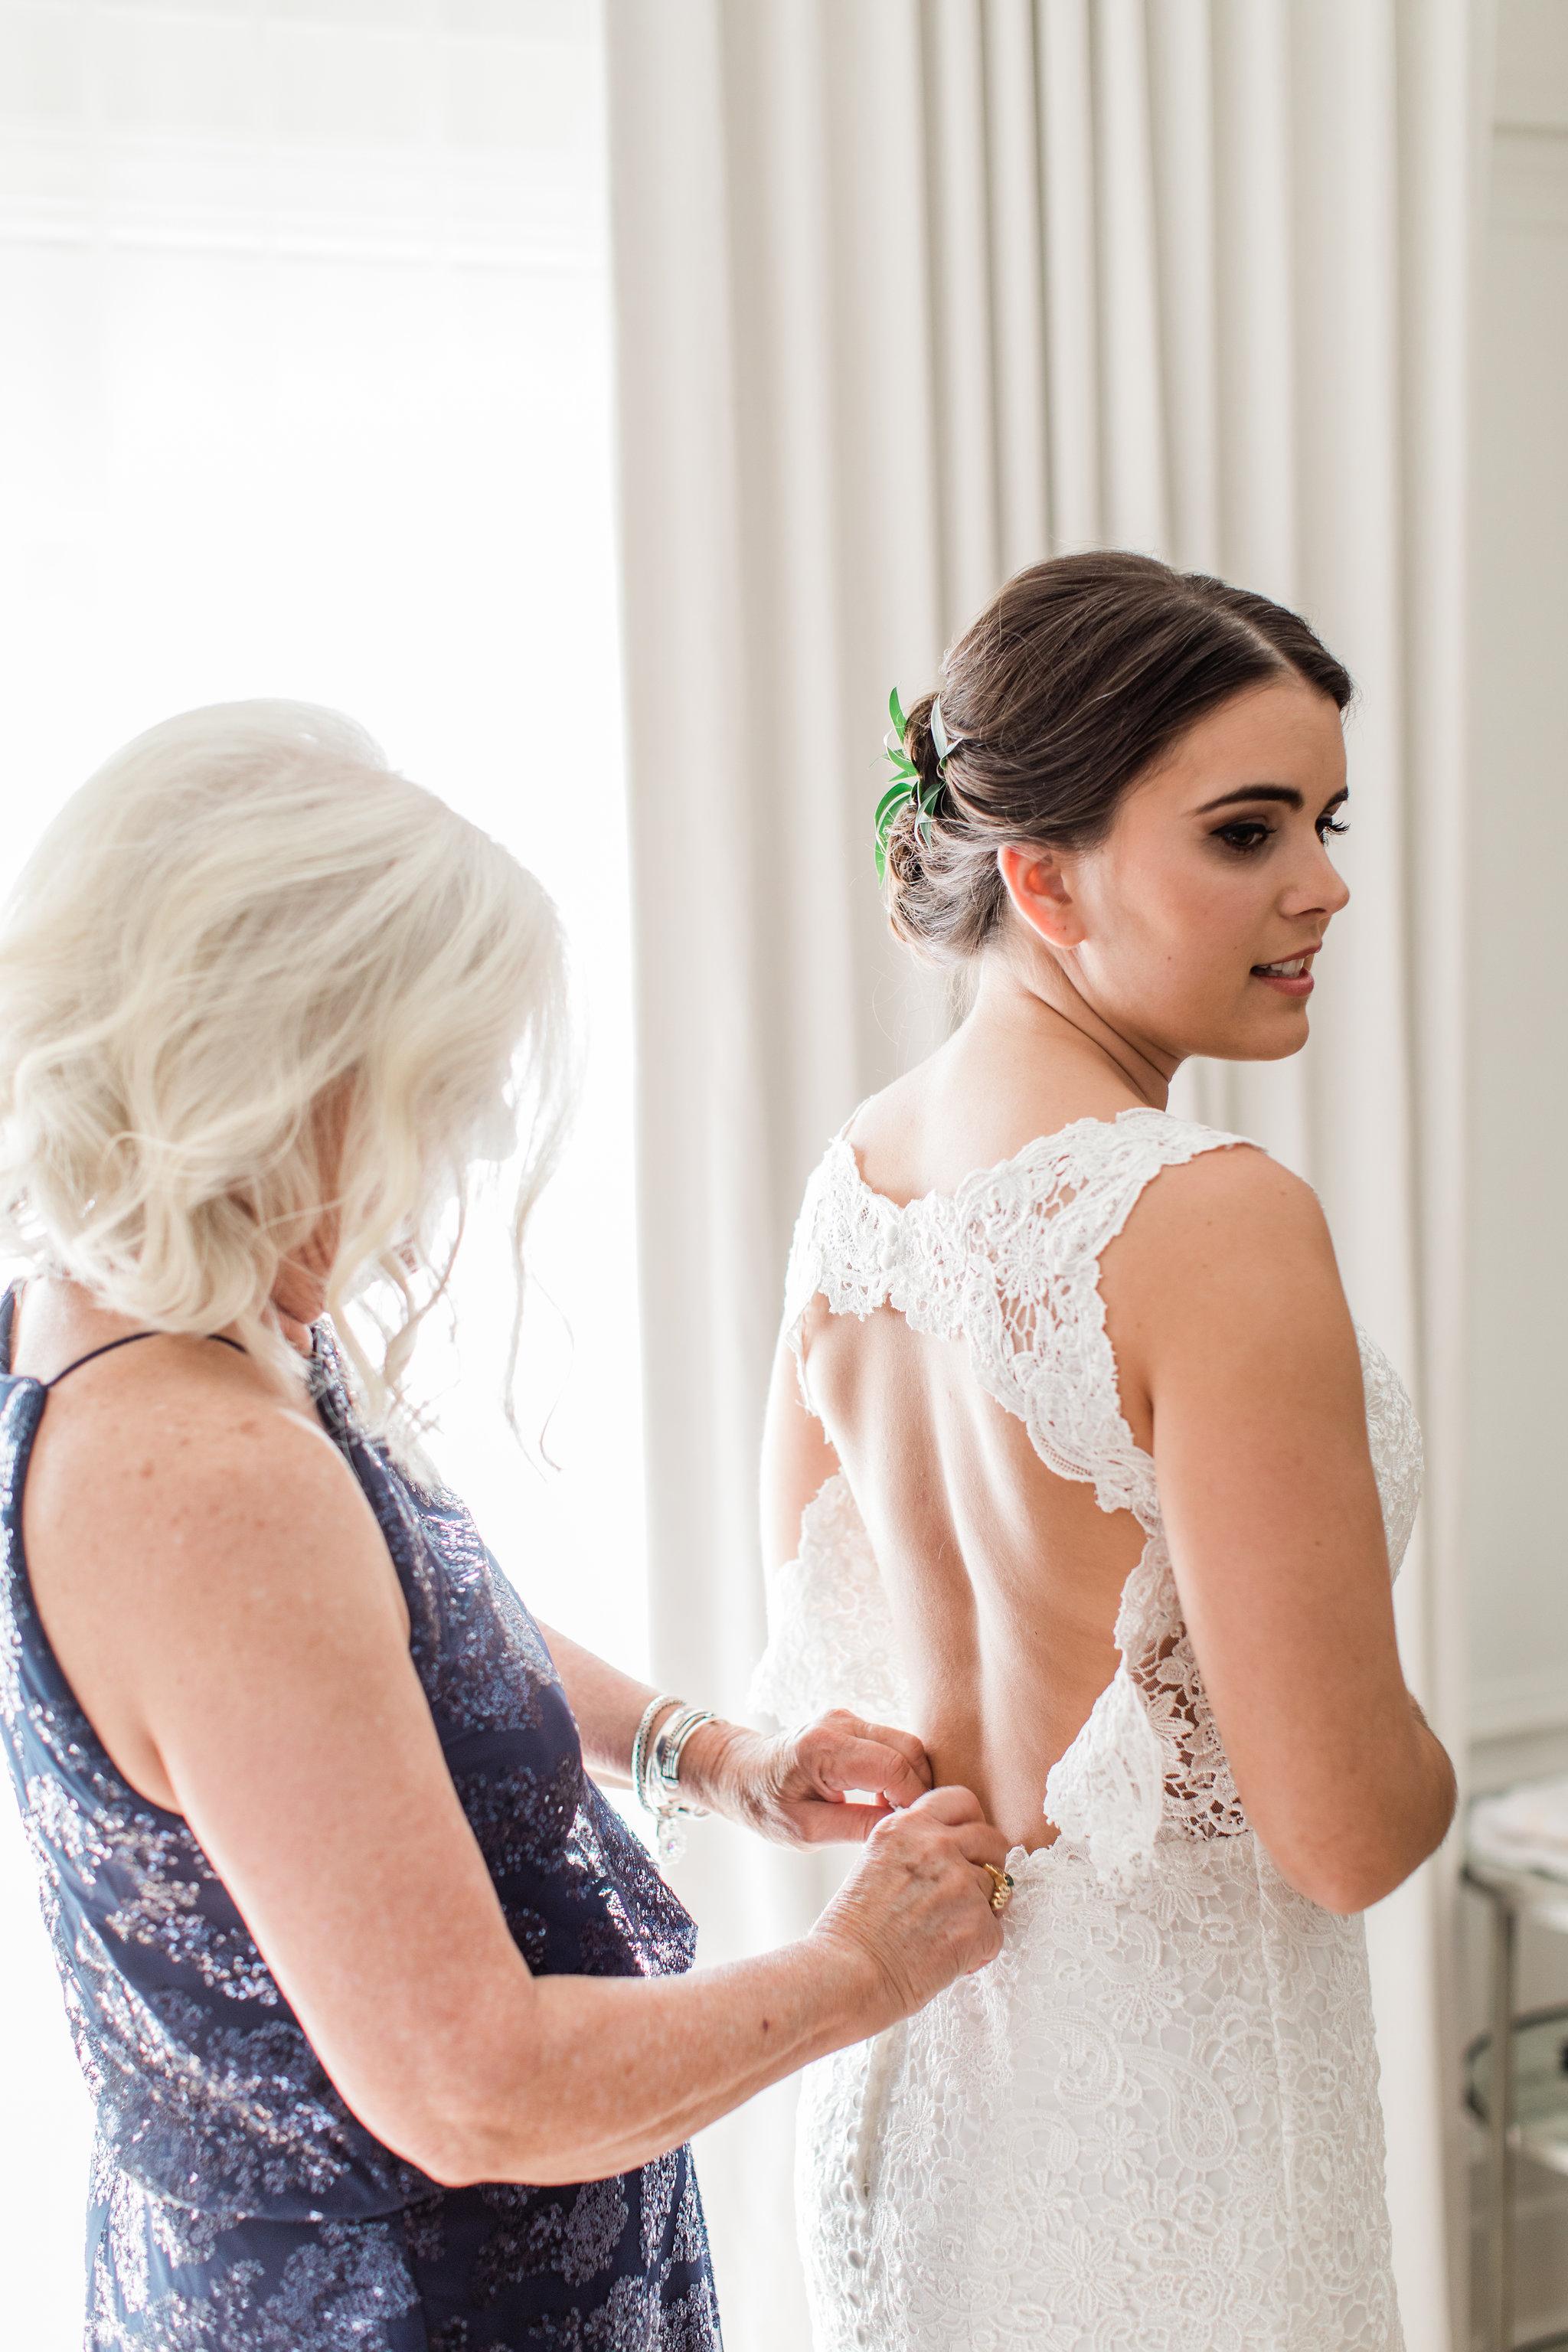 apt-b-photography-Savannah-wedding-photographer-savannah-engagement-photographer-historic-savannah-engagement-charles-h-morris-center-wedding-savannah-weddings-the-brice-hotel-getting-ready-7.JPG